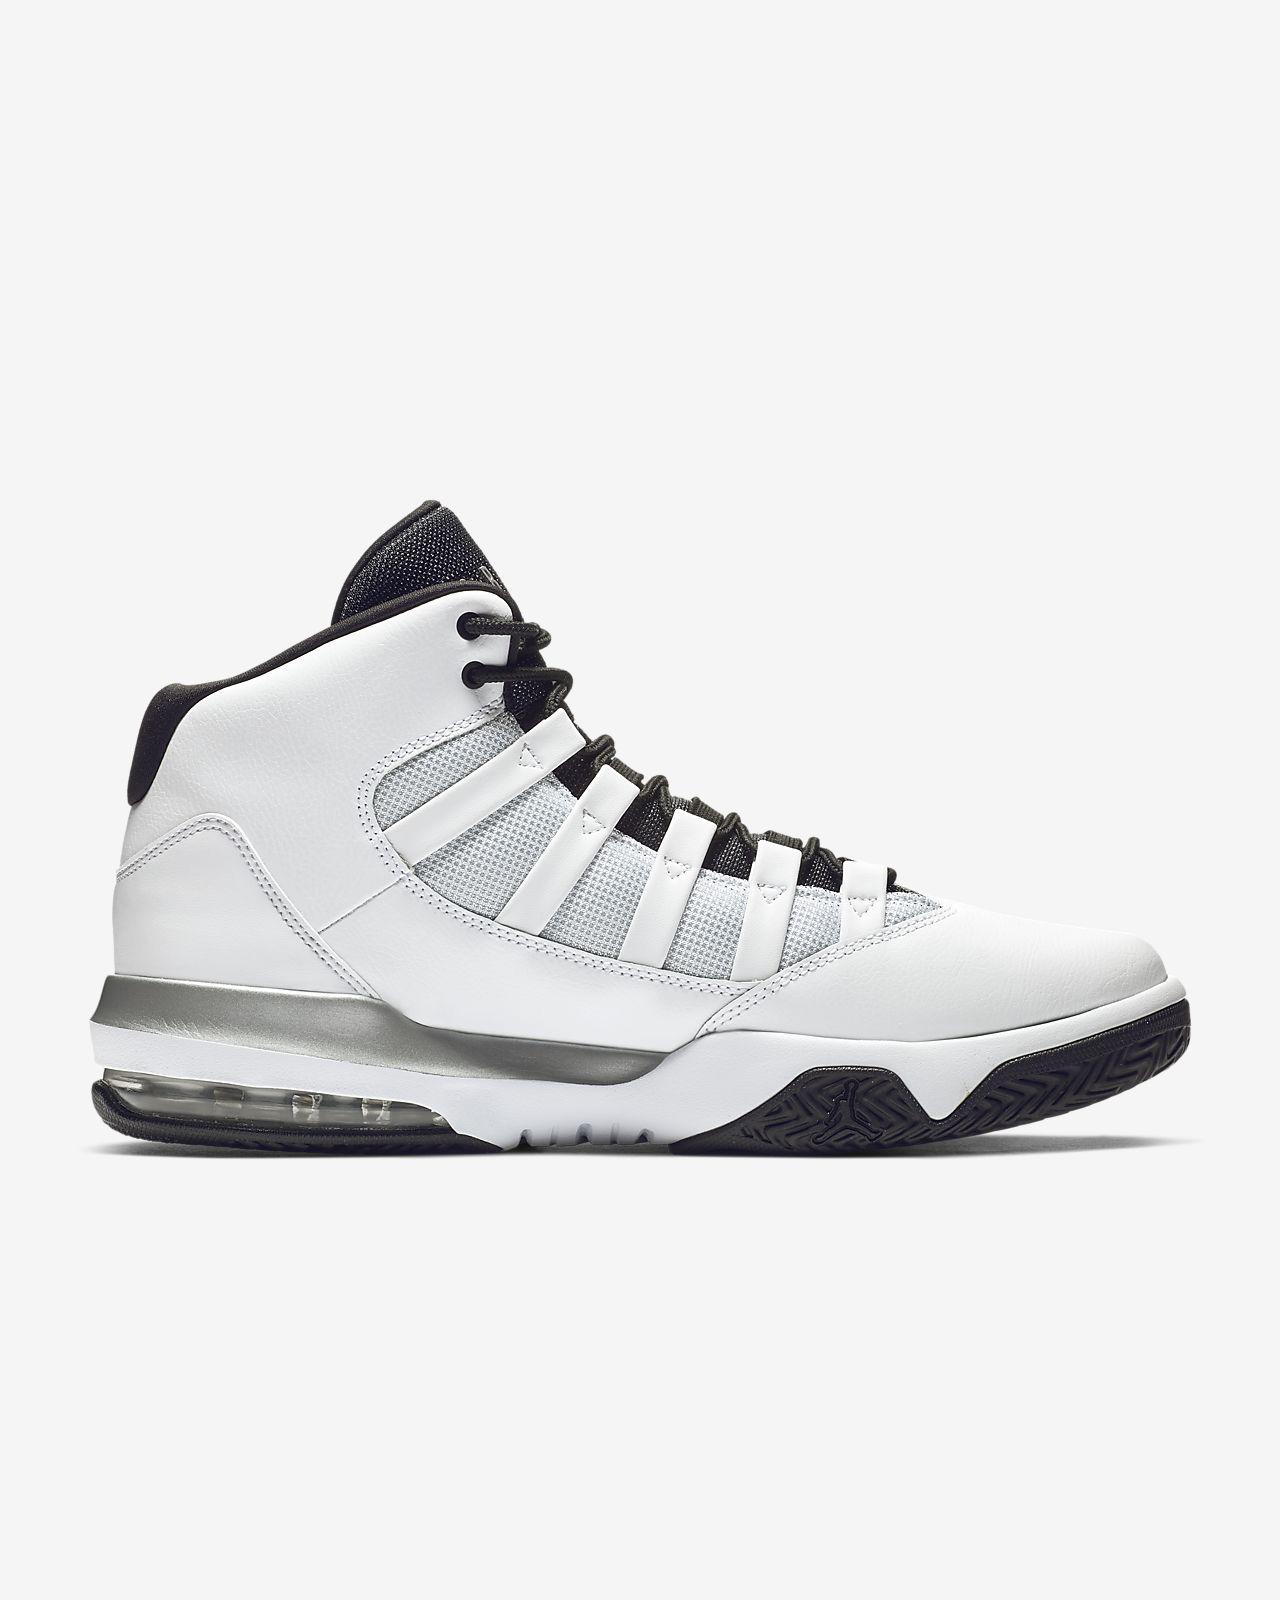 3f3099305db908 Jordan Max Aura Men s Basketball Shoe. Nike.com